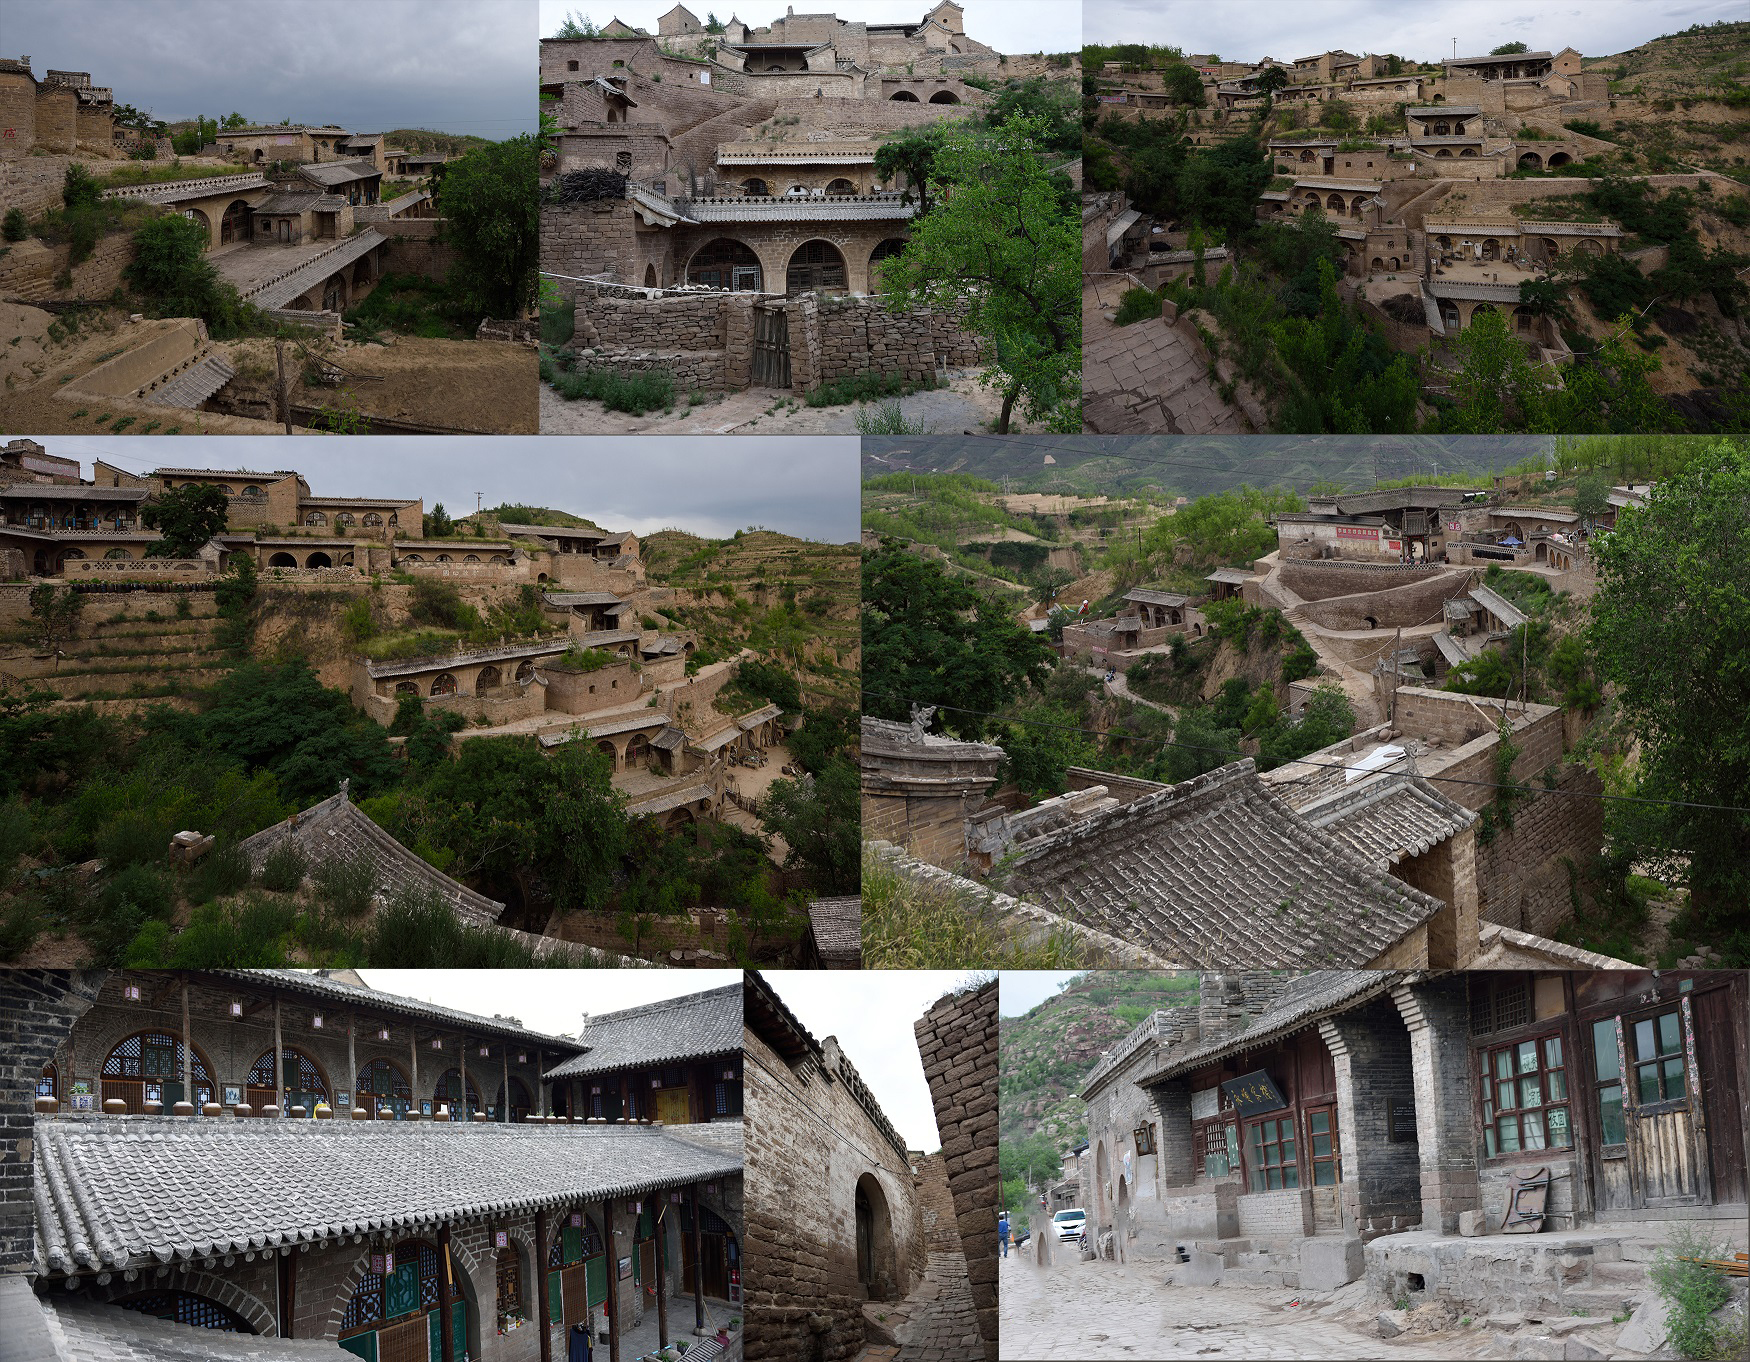 Reference Pack - Li Mountain Village